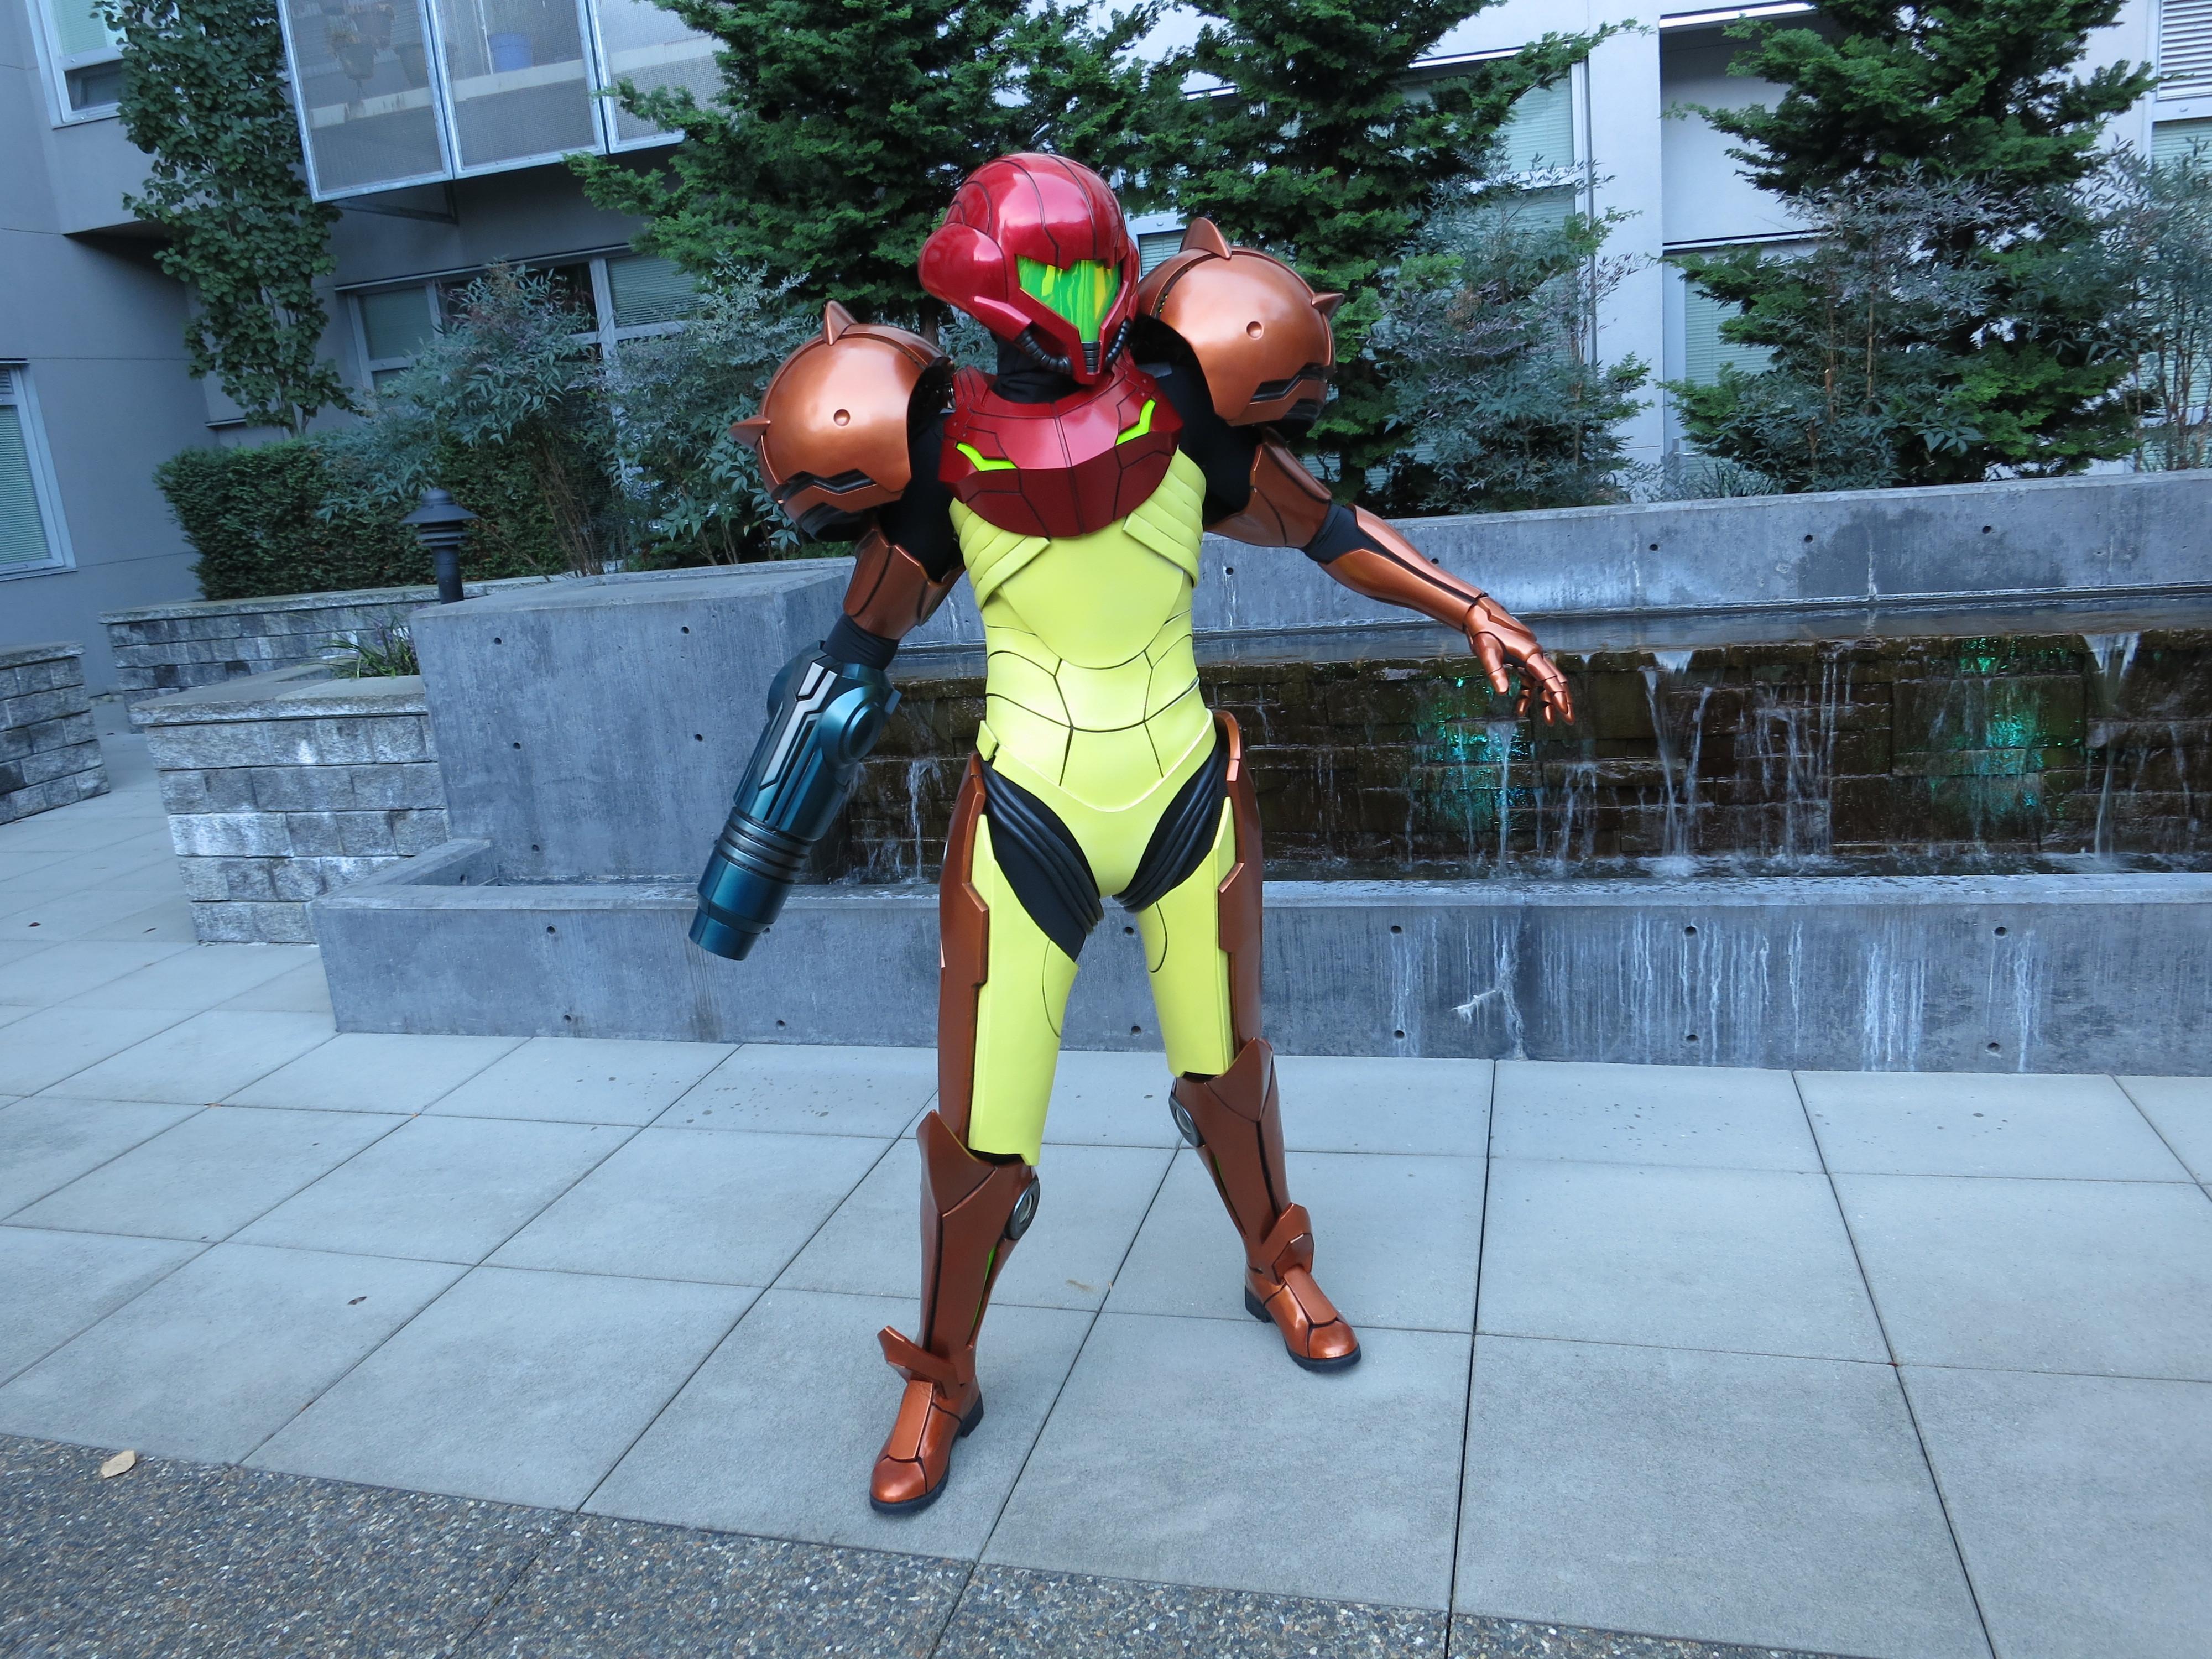 Woman 3D Prints FullSize Samus Aran Varia Suit from